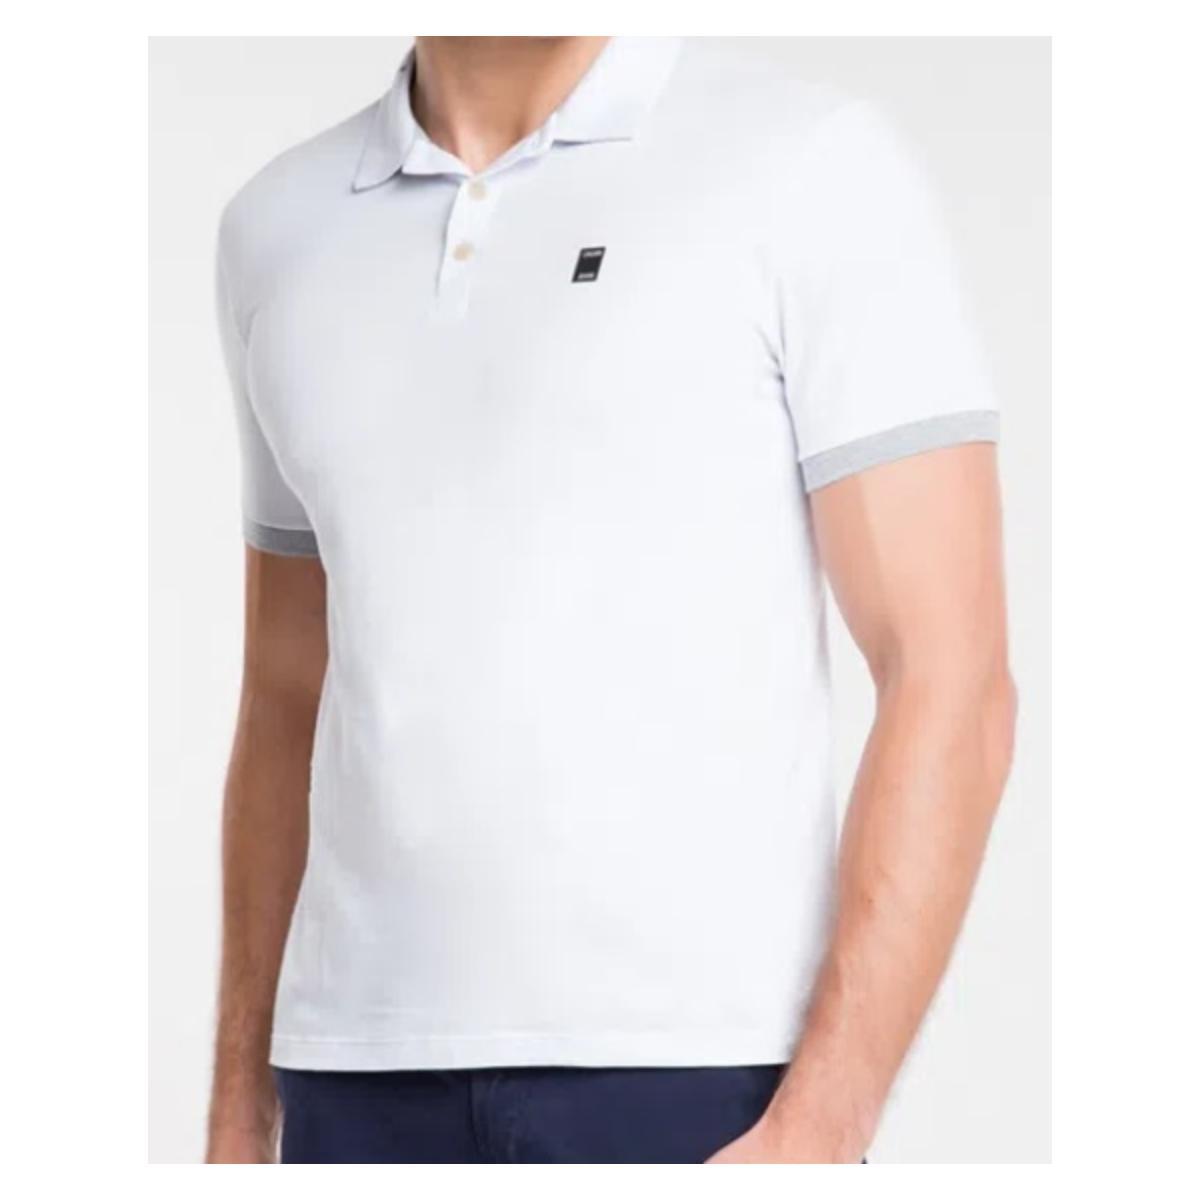 Camisa Masculina Calvin Klein Cm0oc02pc437 Branco